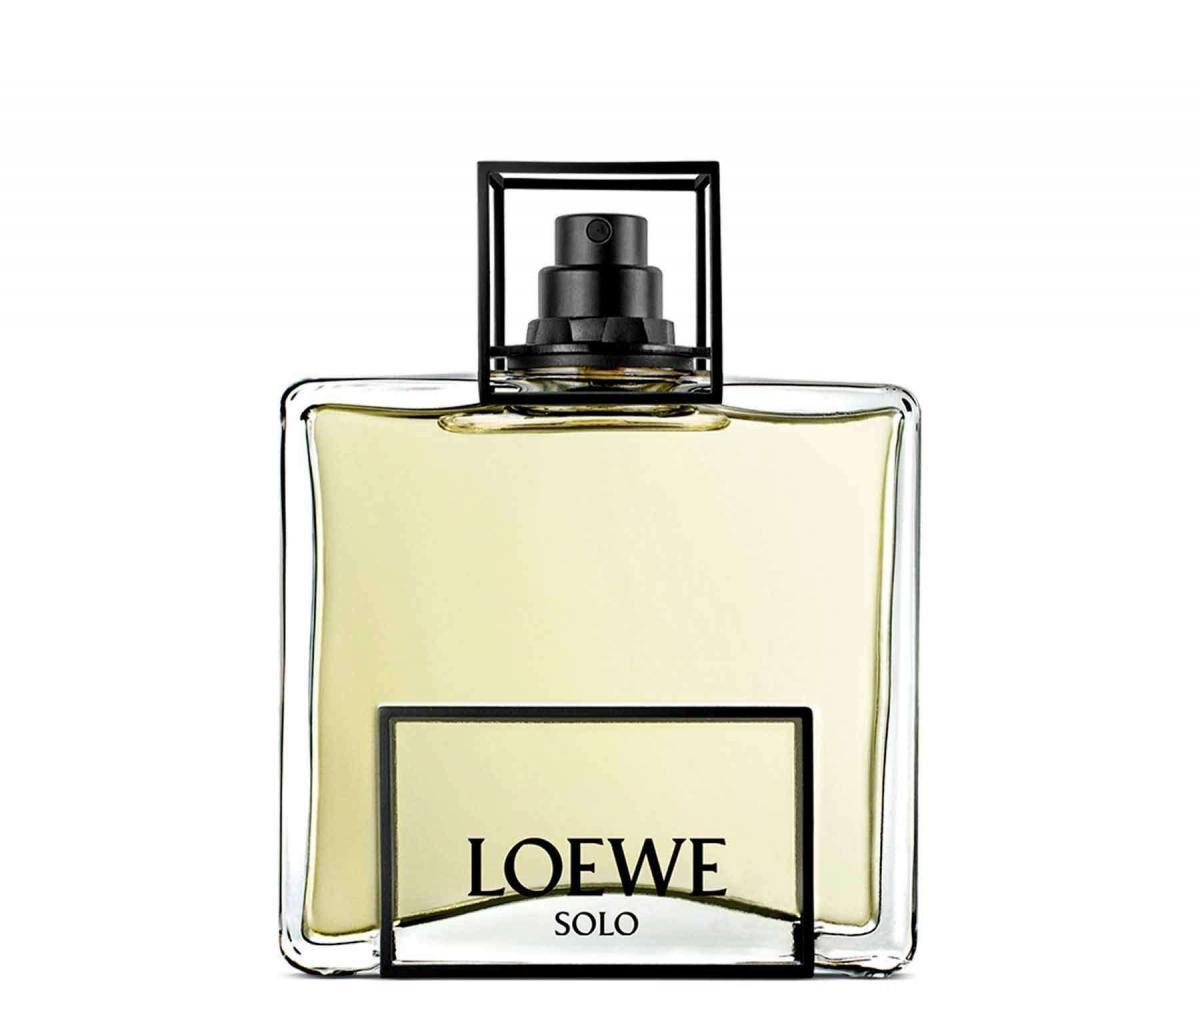 solo loewe perfume mujer